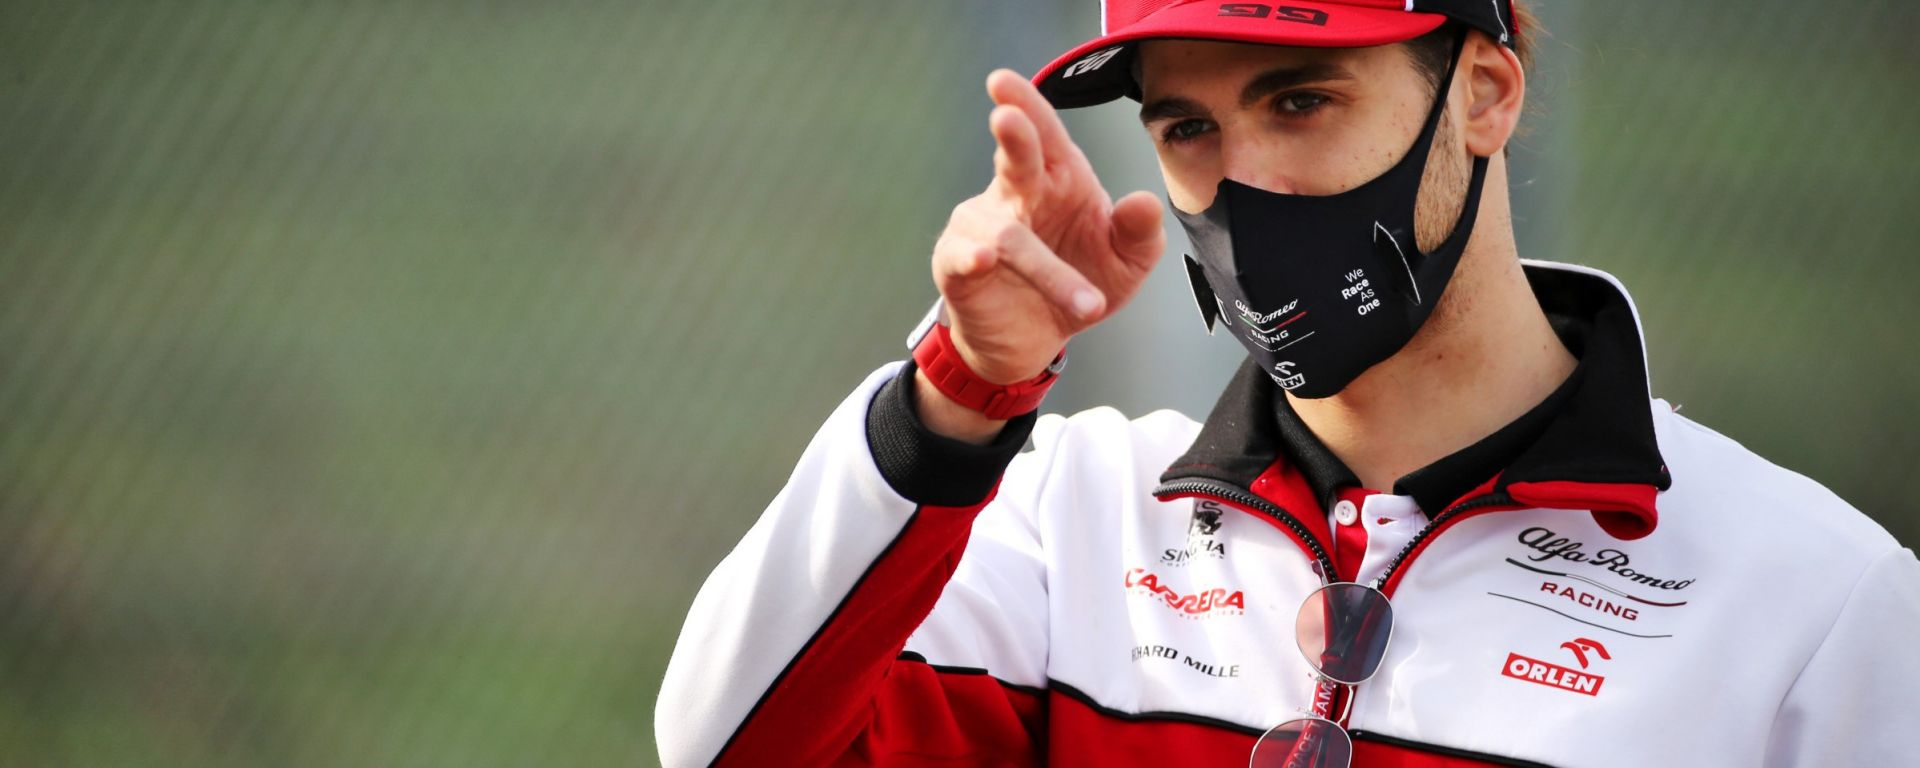 F1 2021: Antonio Giovinazzi (Alfa Romeo) unico pilota italiano al via